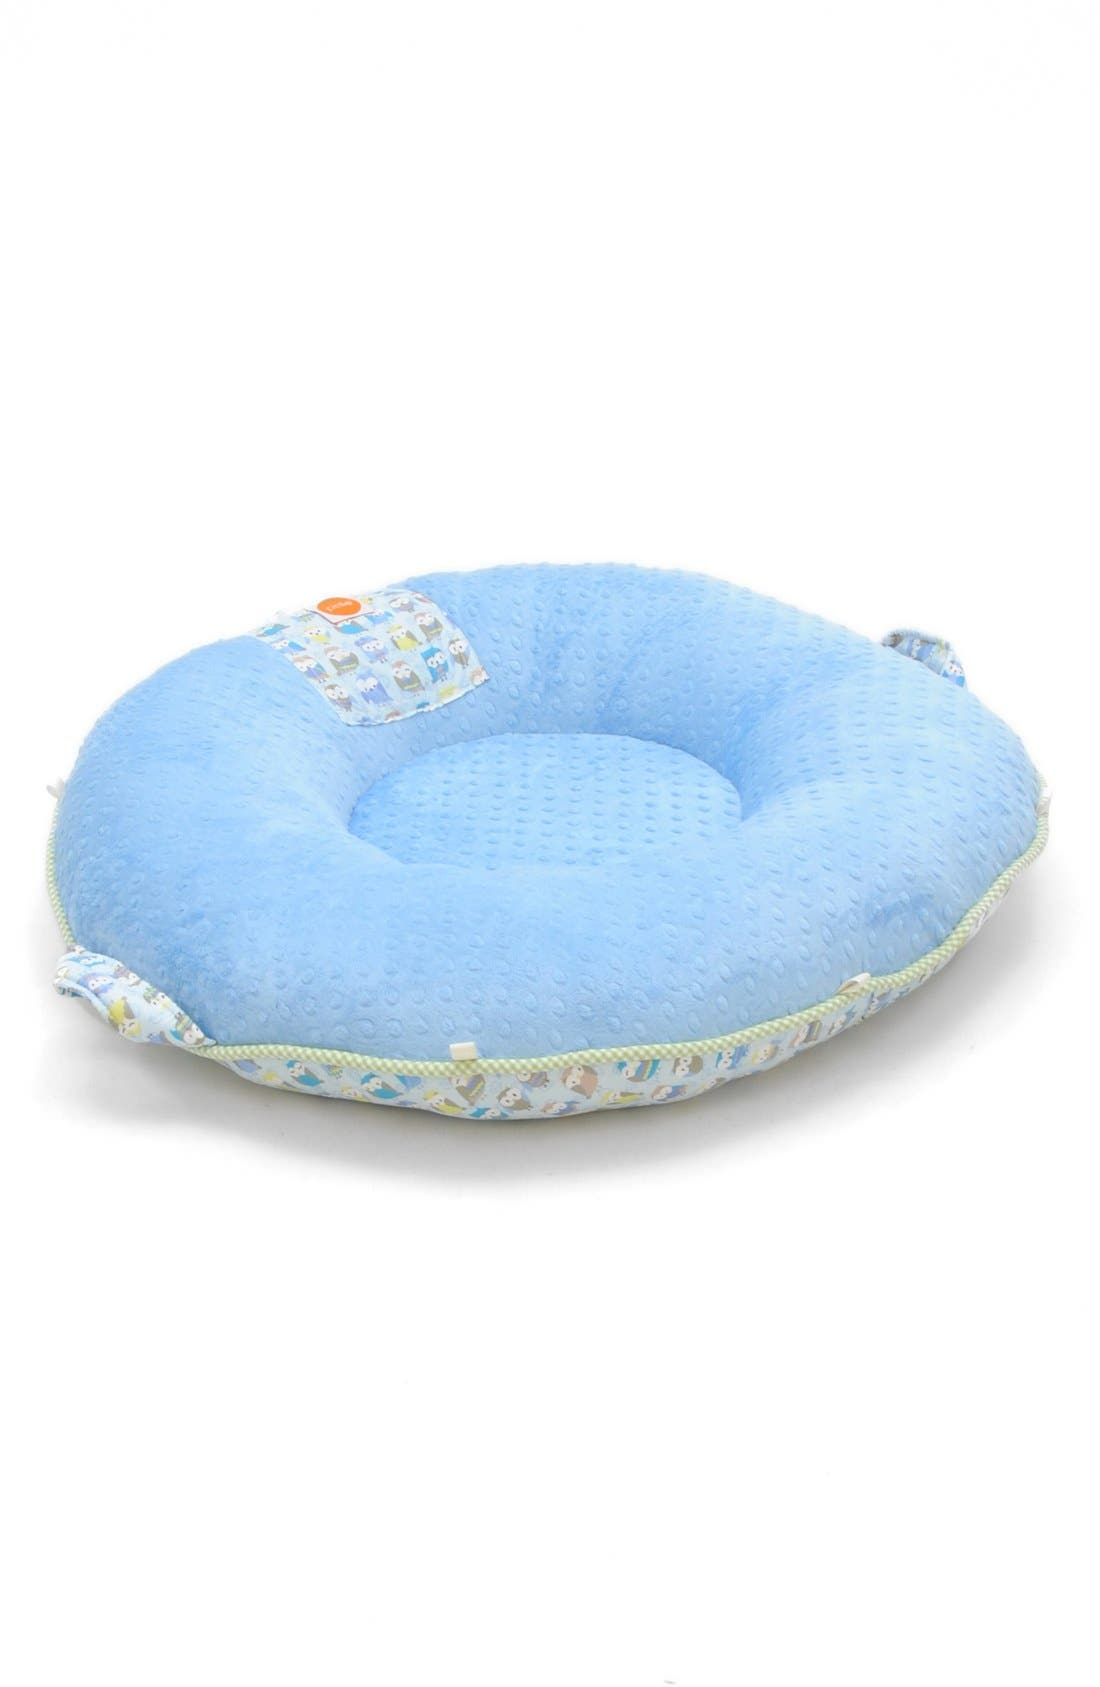 Alternate Image 3  - Pello 'Pello - Hoo Loves Ya Boy' Portable Floor Pillow (Baby)